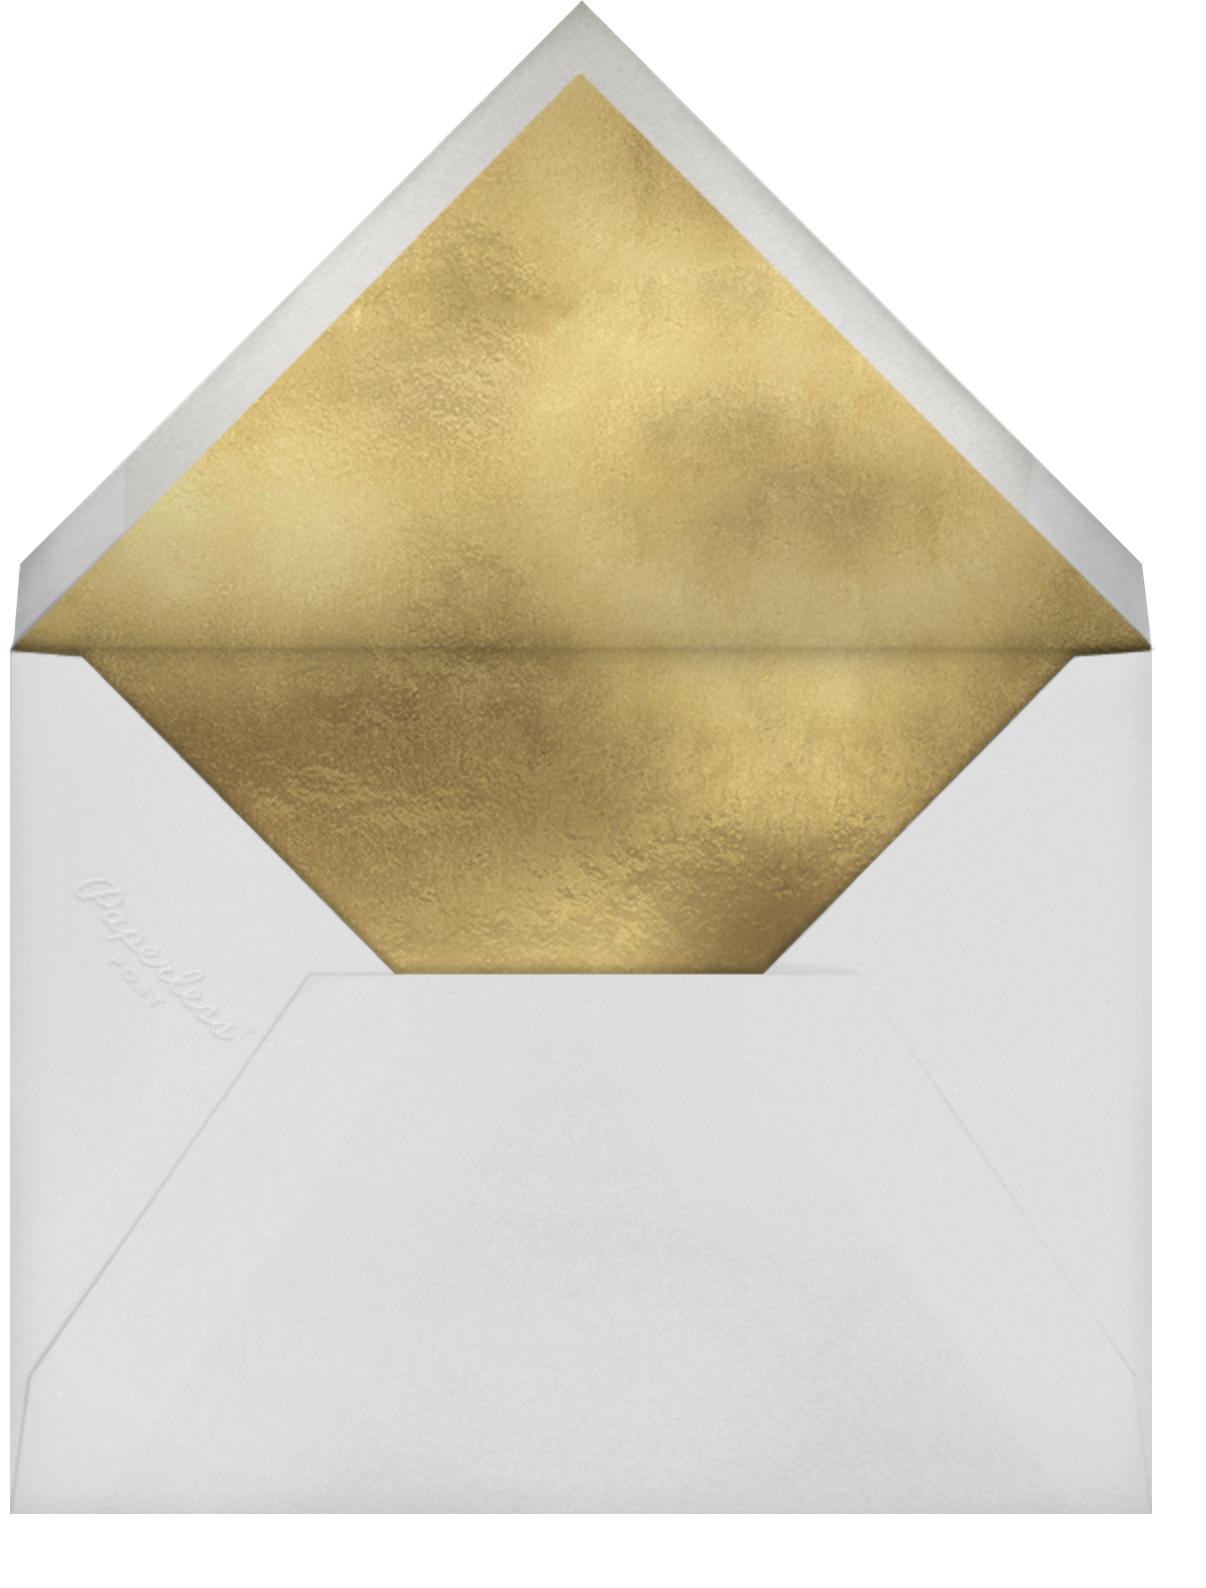 Bright Joy - Little Cube - Envelope